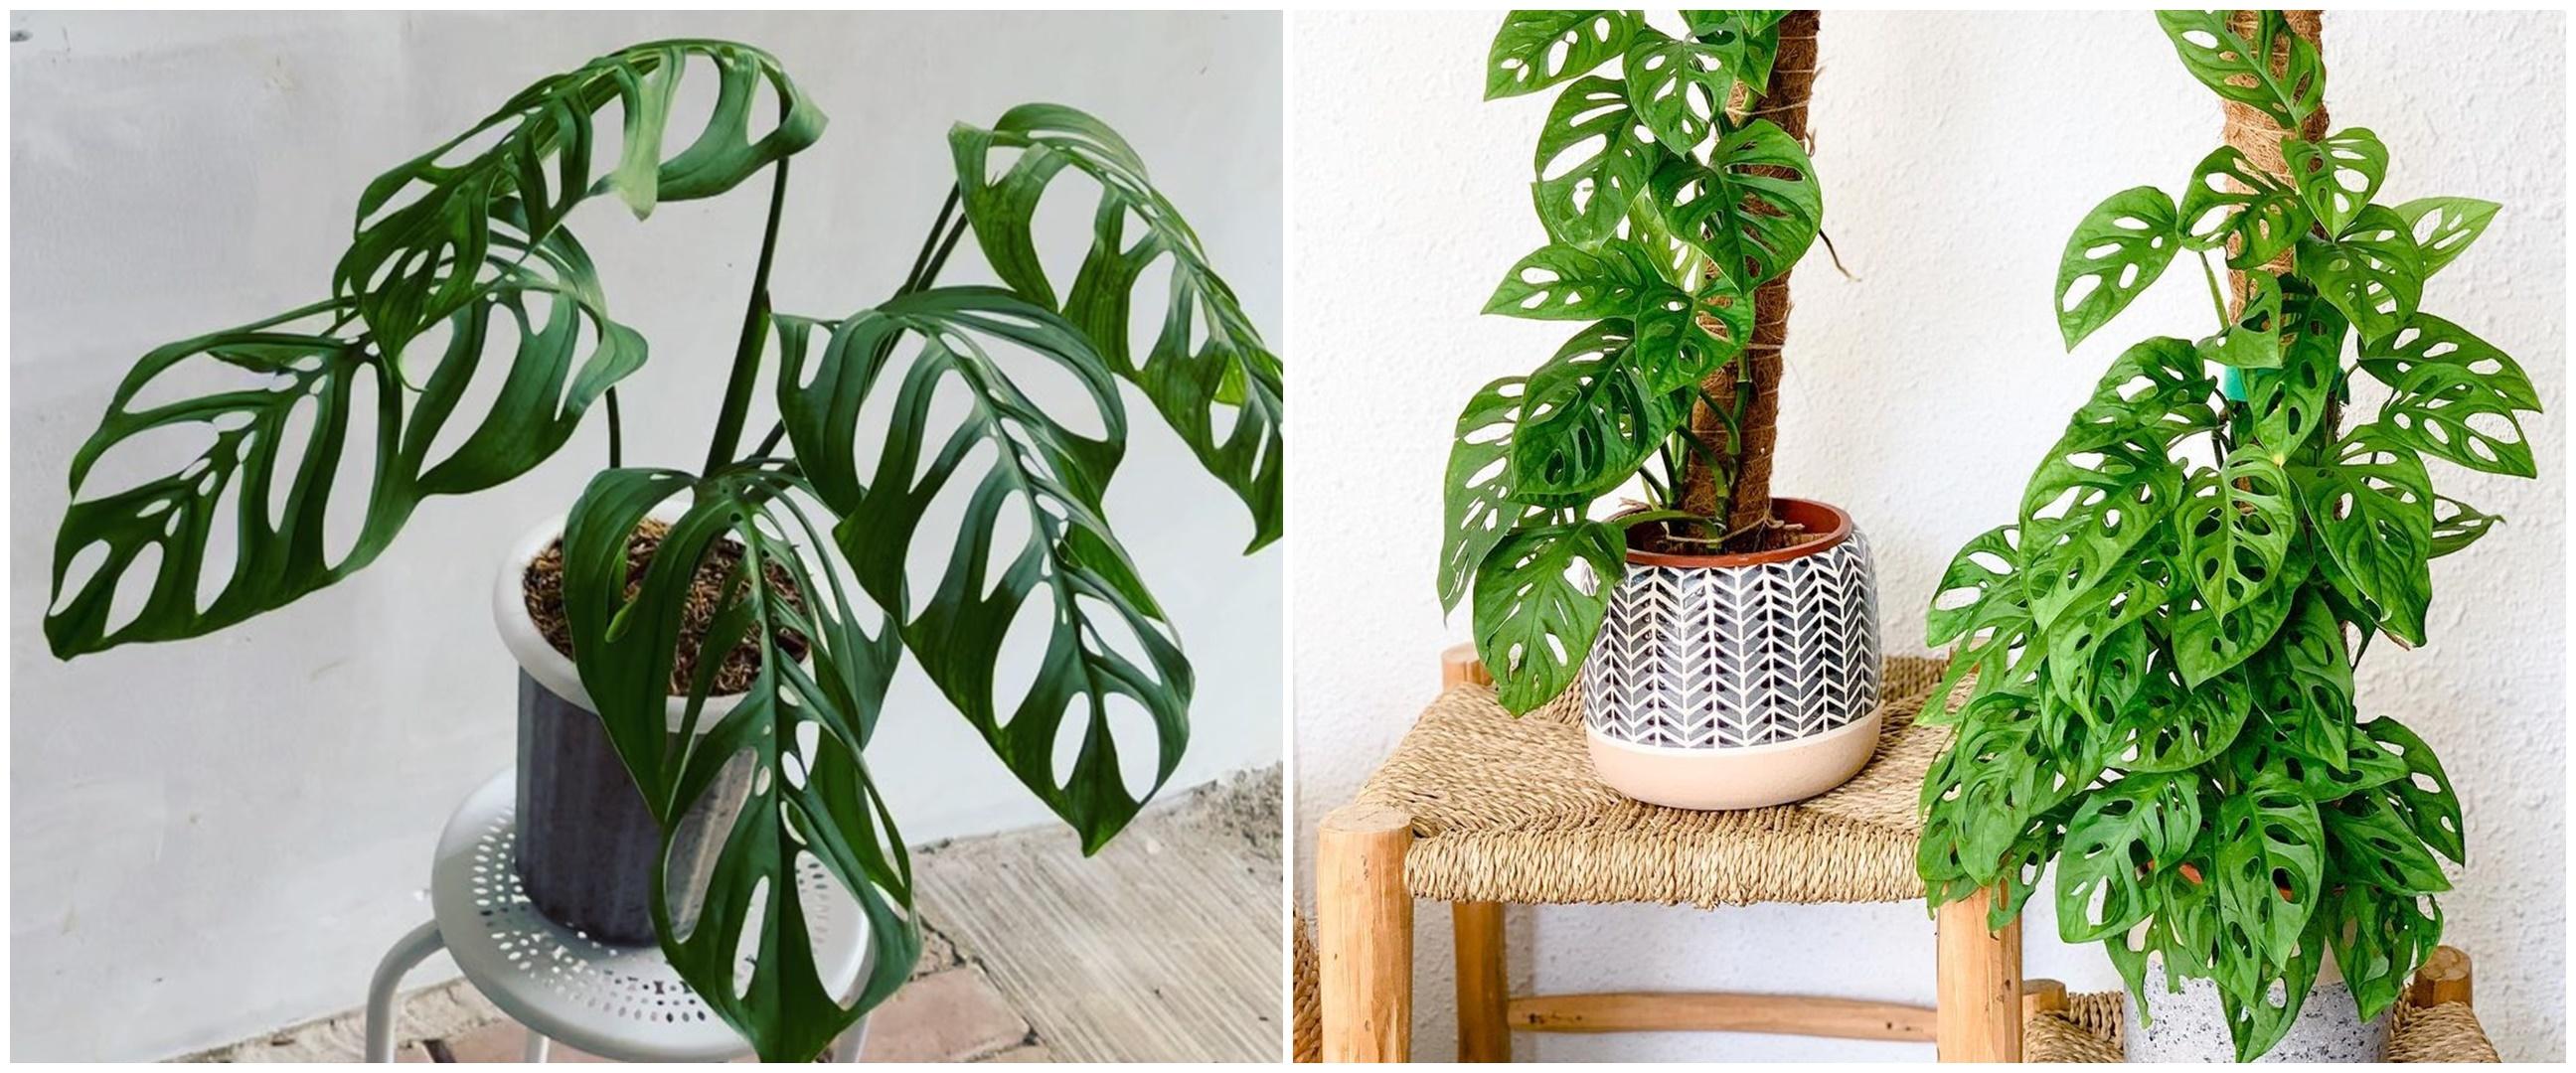 10 Jenis tanaman hias daun bolong, cocok buat indoor dan outdoor